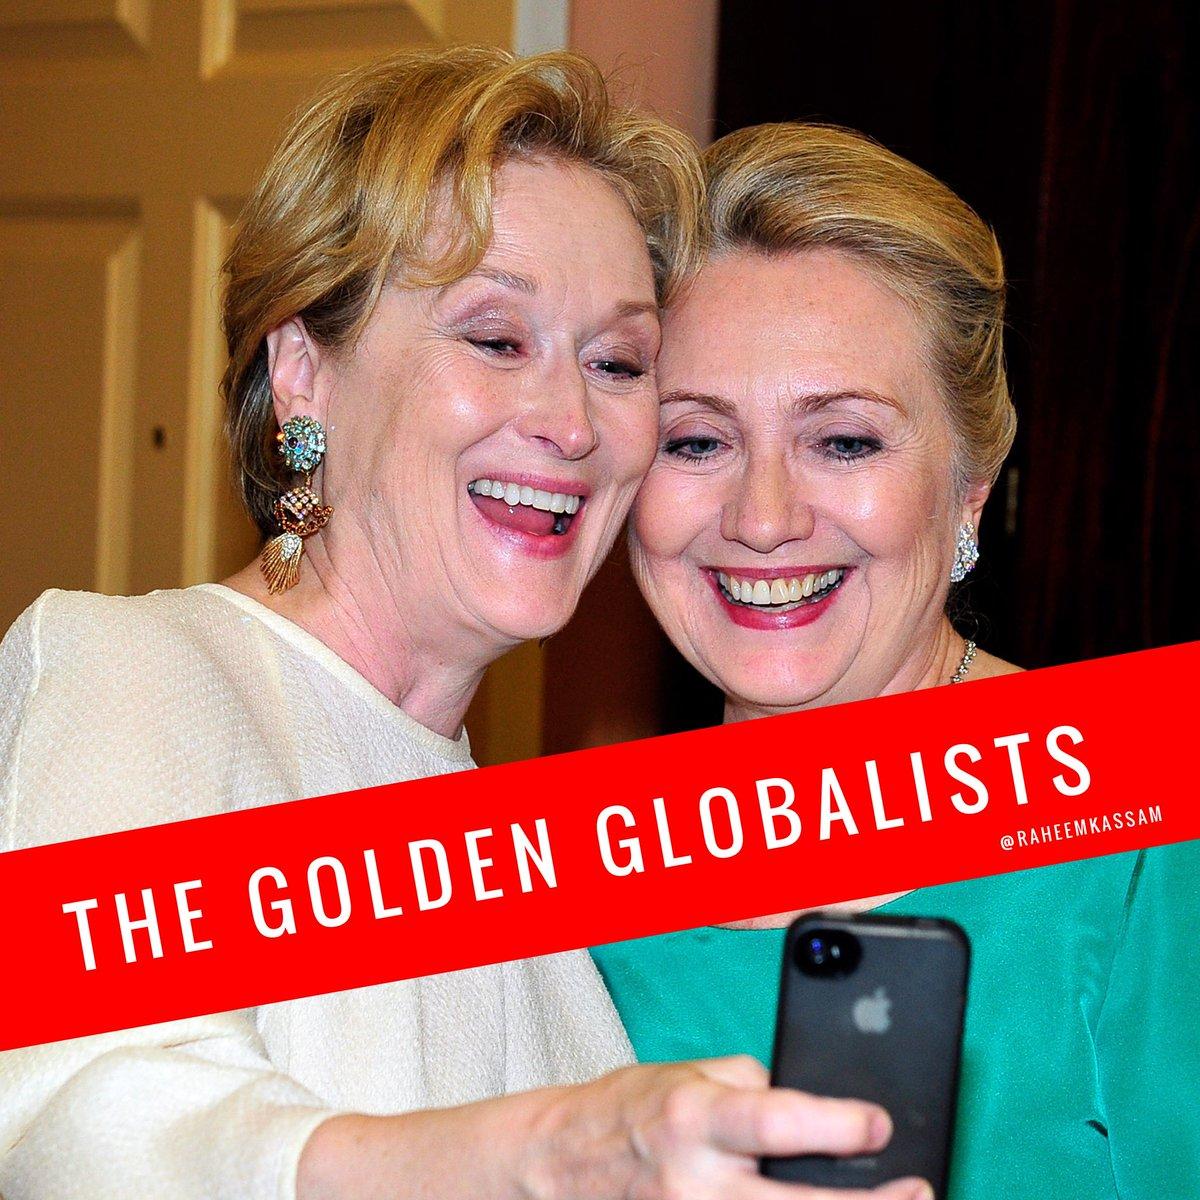 #TheGoldenGlobalists https://t.co/MeiF3nmeSw